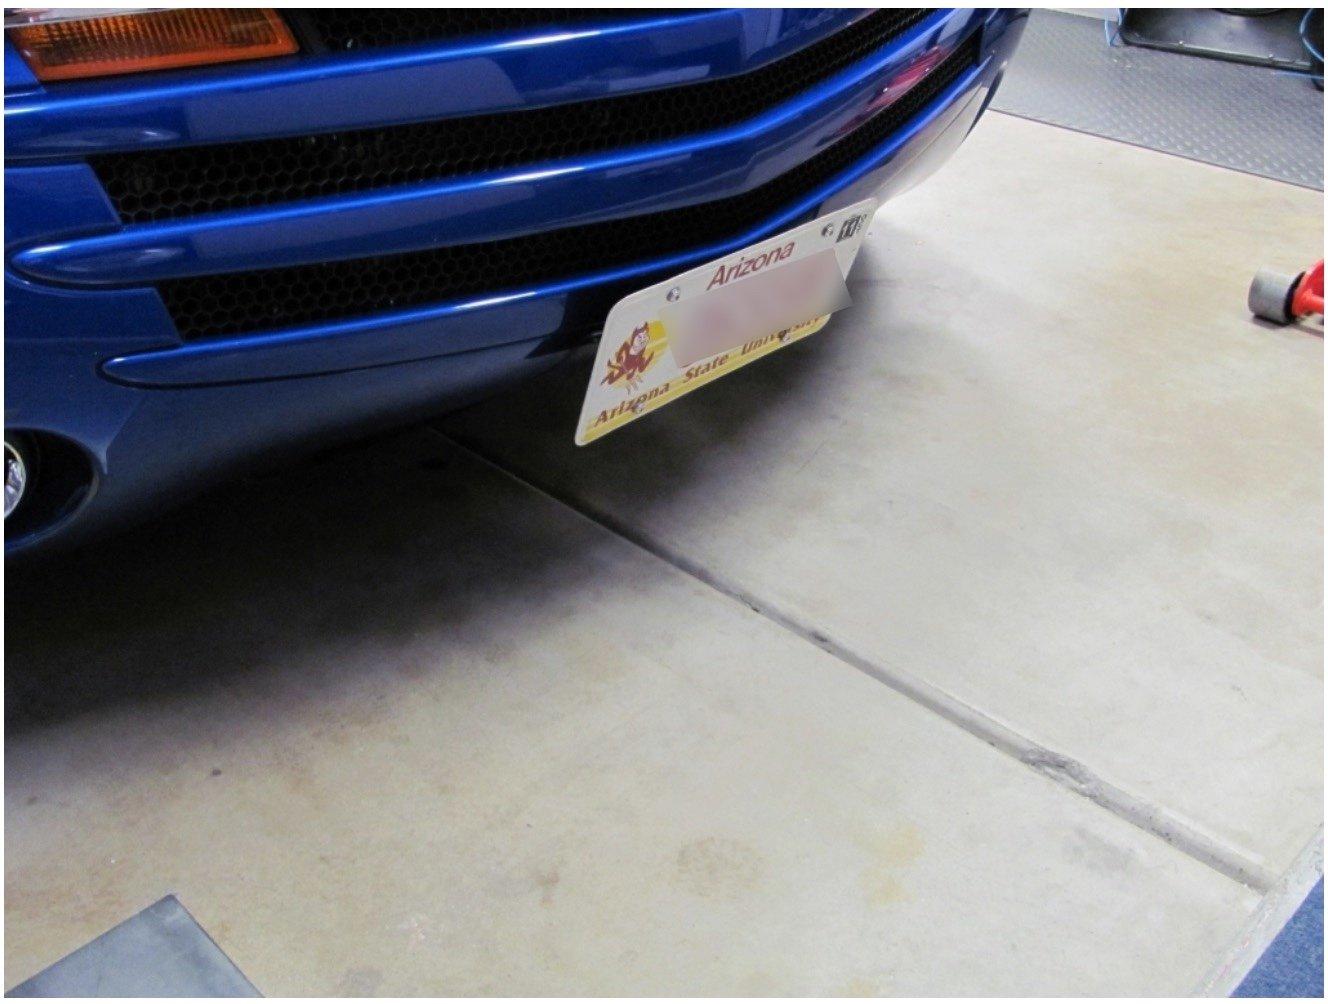 SSR Front License Plate Mount